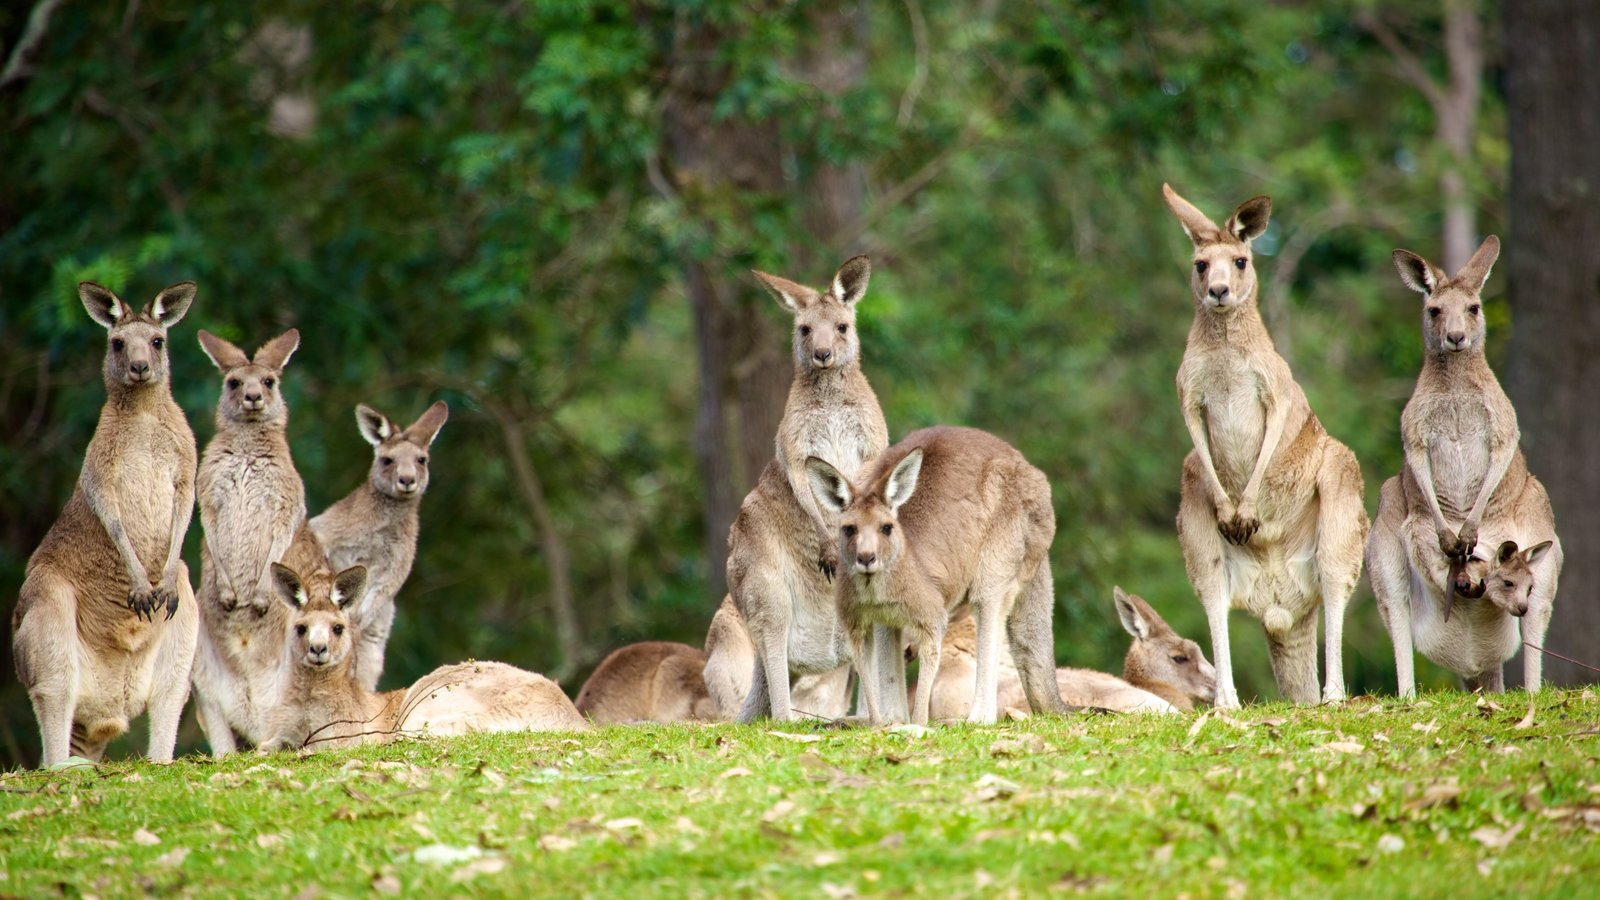 Lone Pine Koala Sanctuary showing land animals and zoo animals